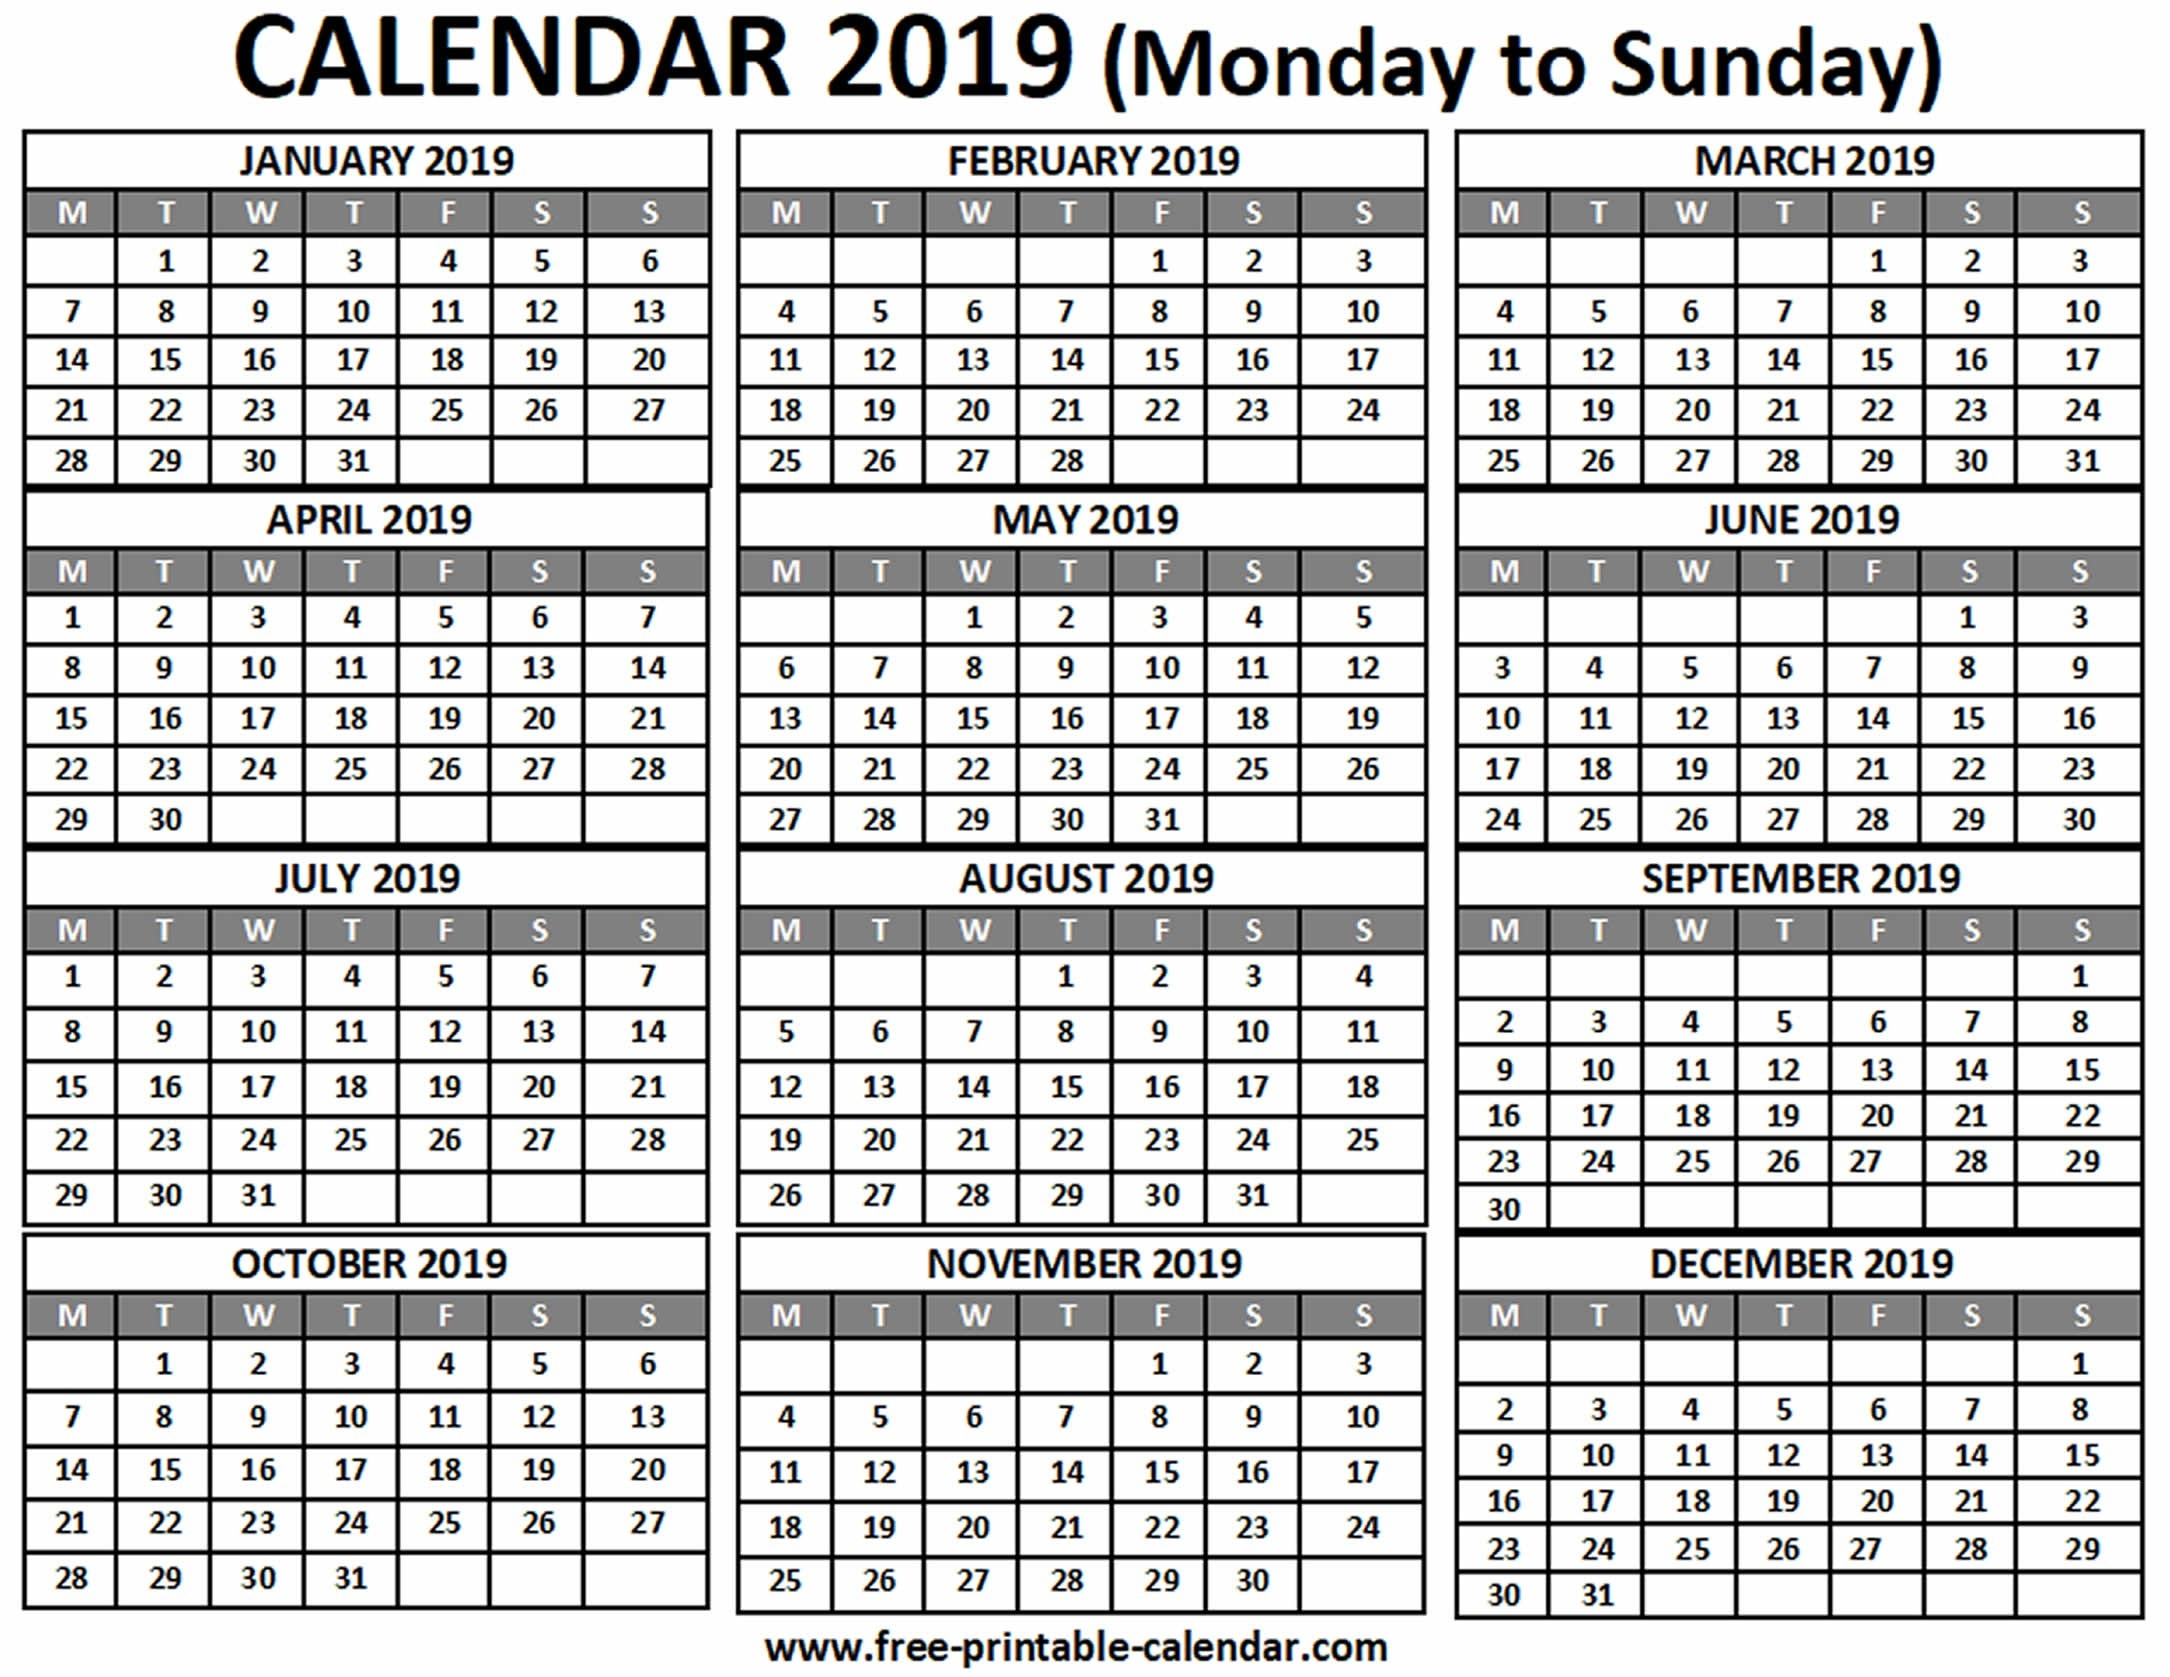 2019 Calendar - Free-Printable-Calendar-Free Printable Blank Single Page Month Calendar